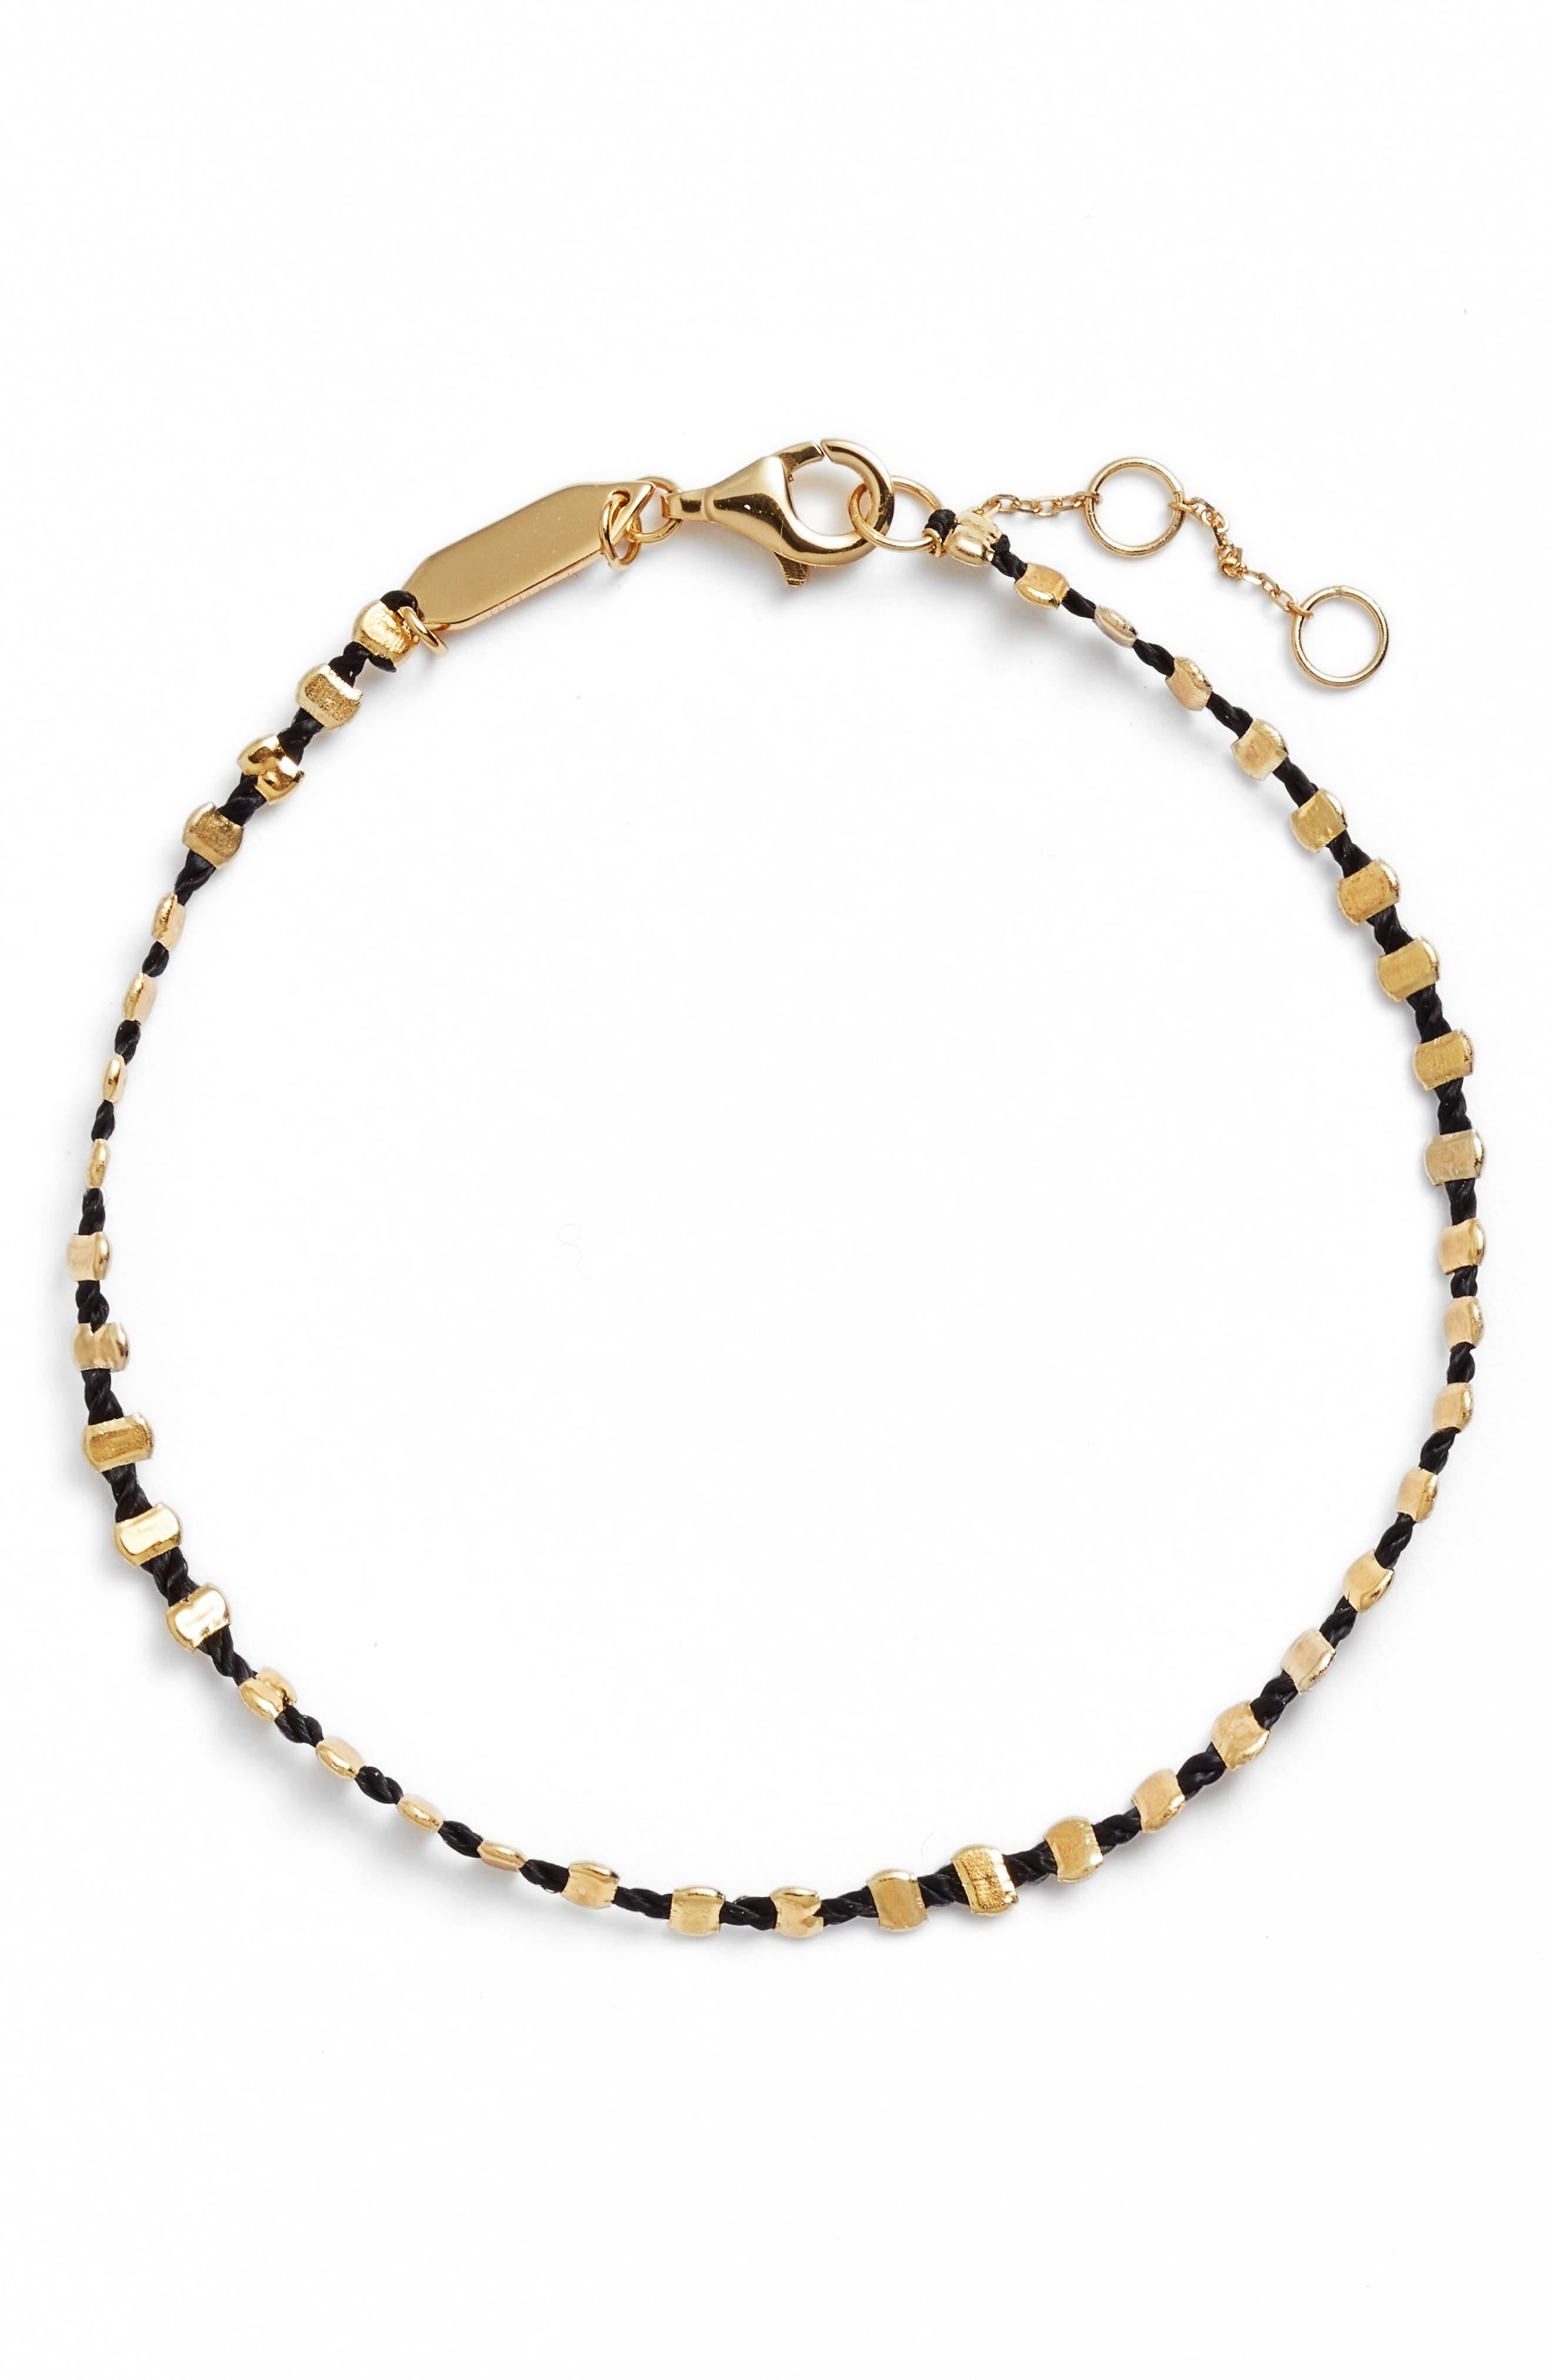 Argento Vivo Sydney Vermeil Studded Black Band Bracelet